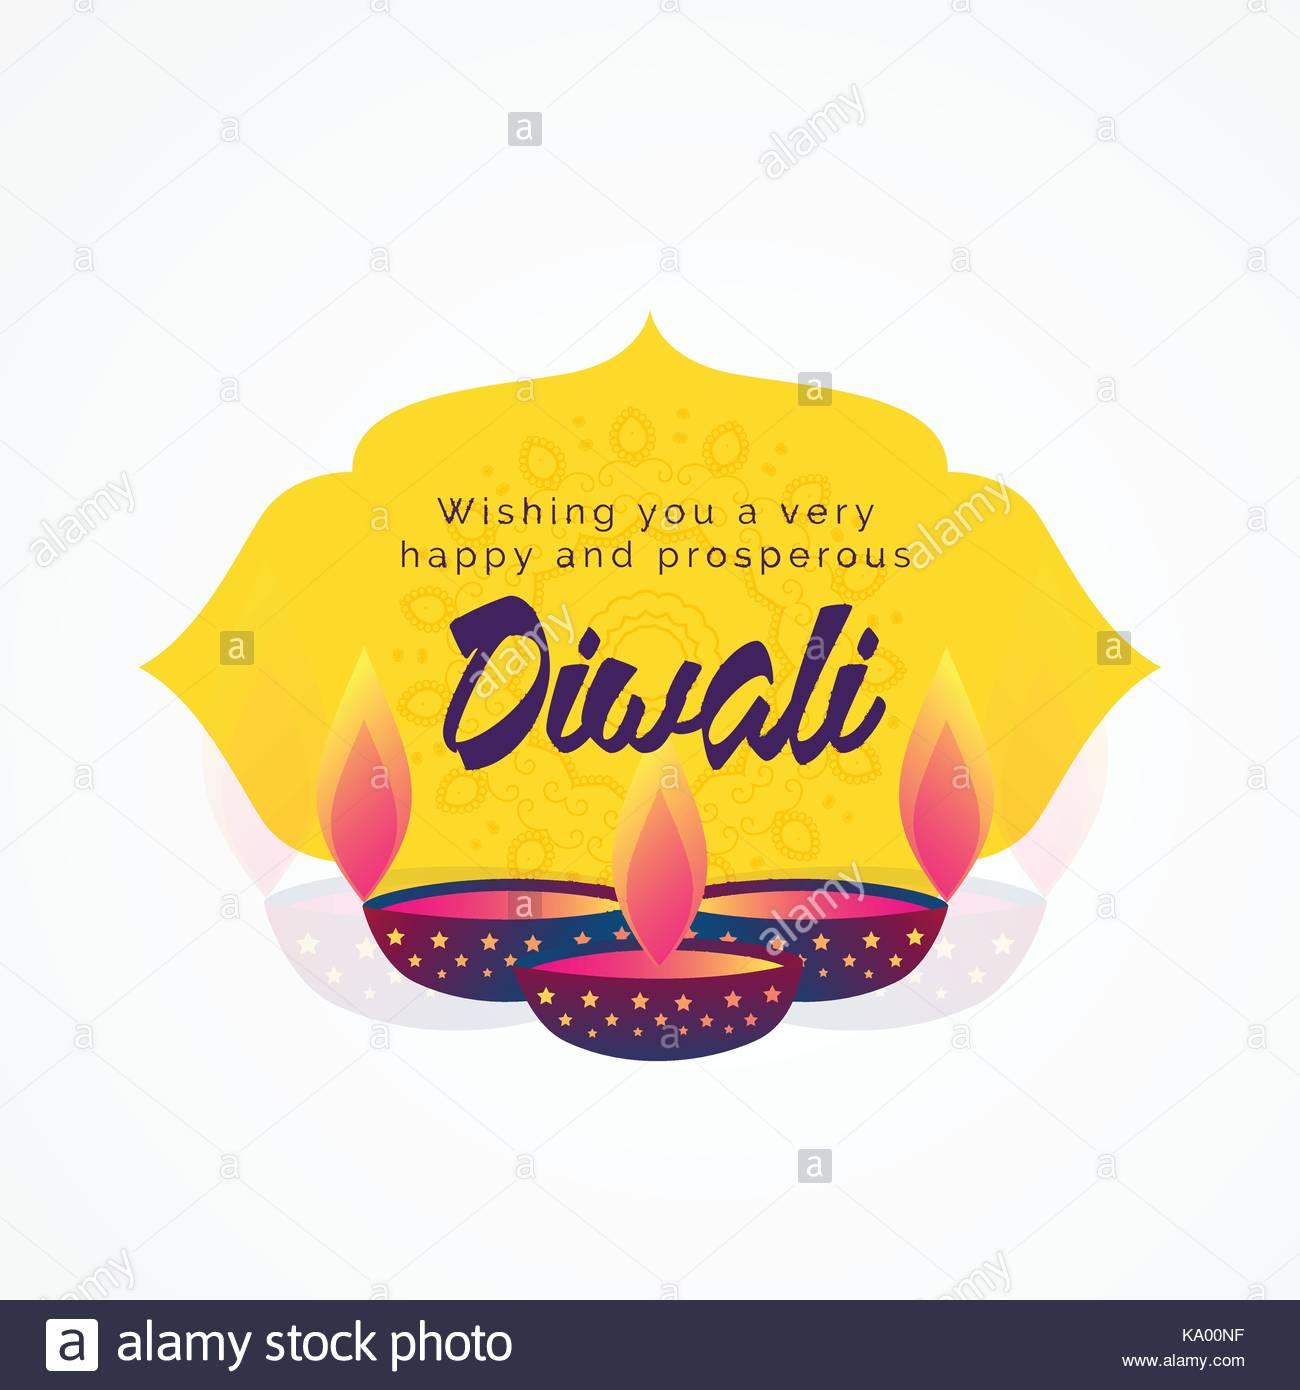 Diwali Wishes Greeting Card Design With Diya Stock Vector Art